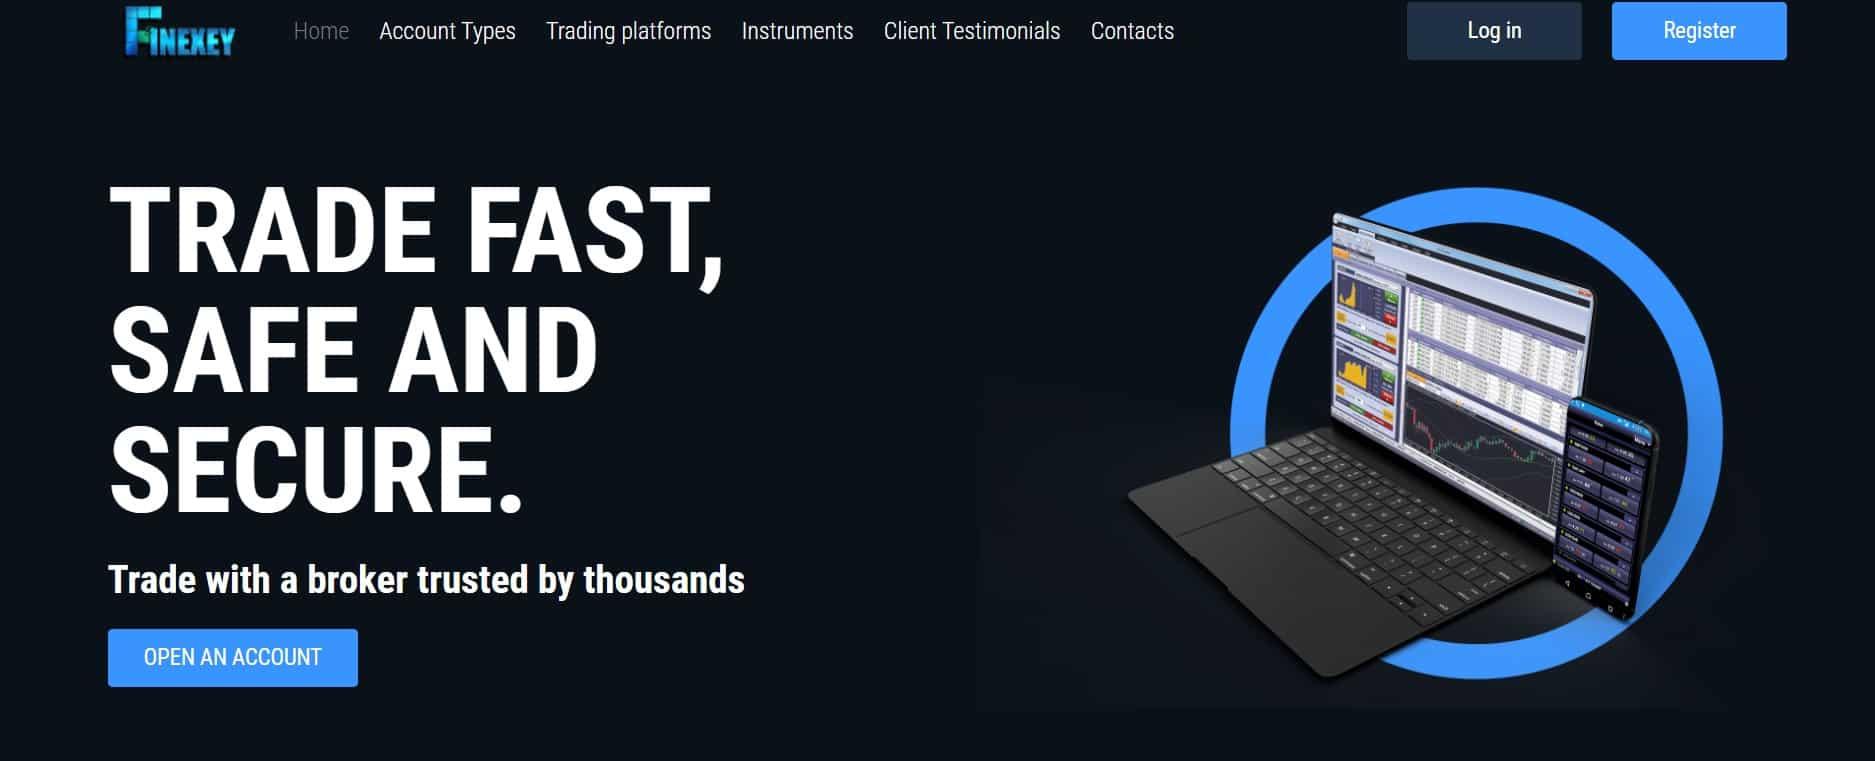 Finexey website